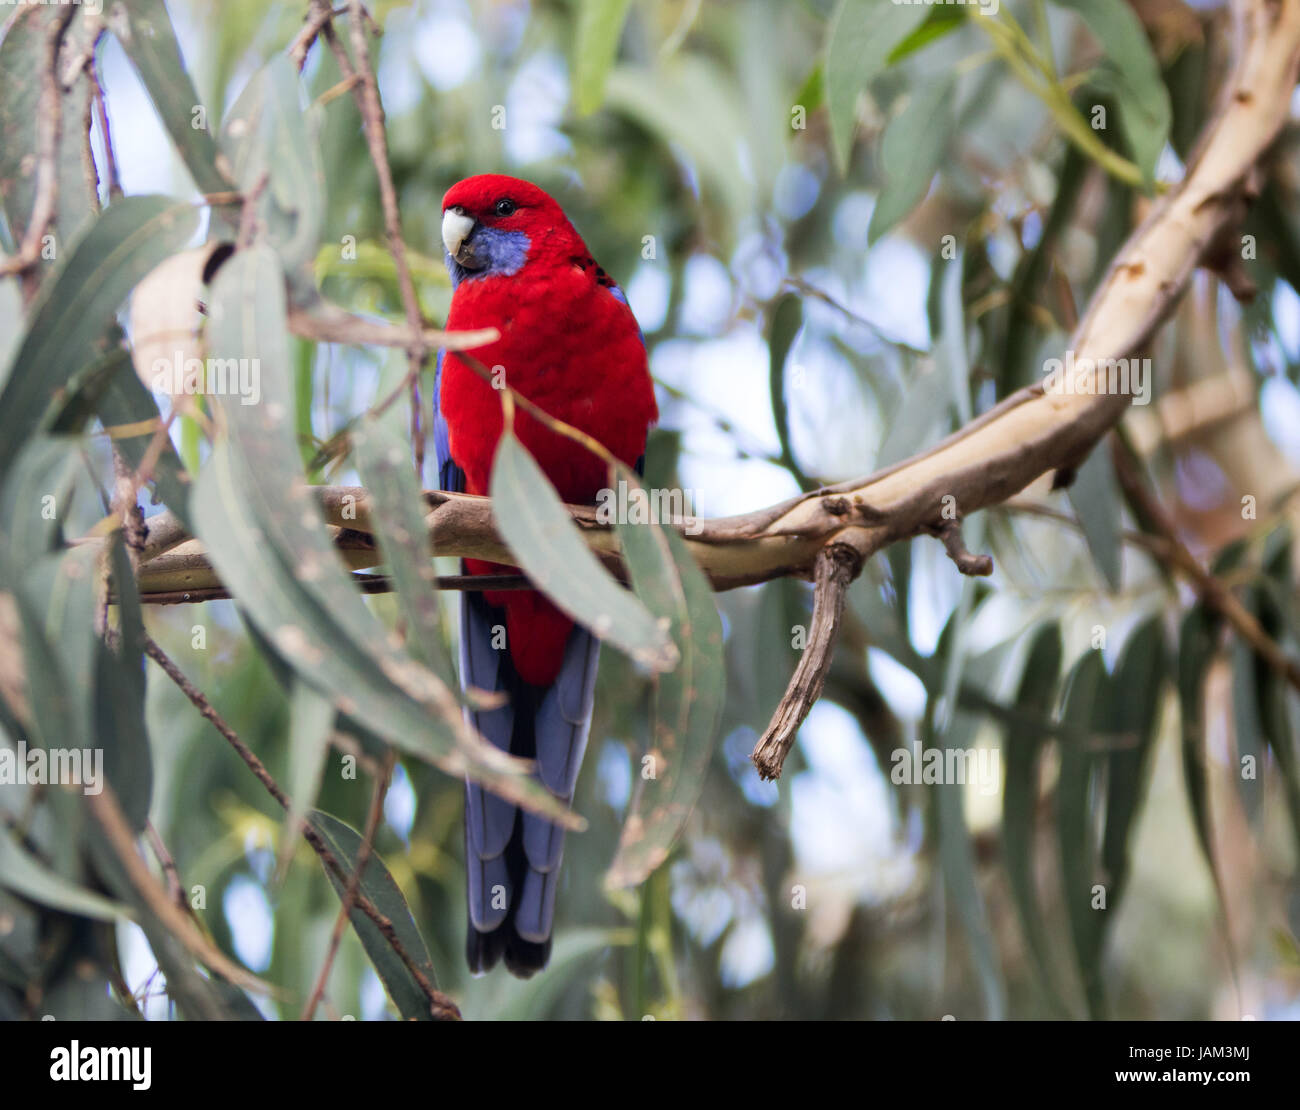 red australian parrot sitting in a eucalyptus tree - Stock Image